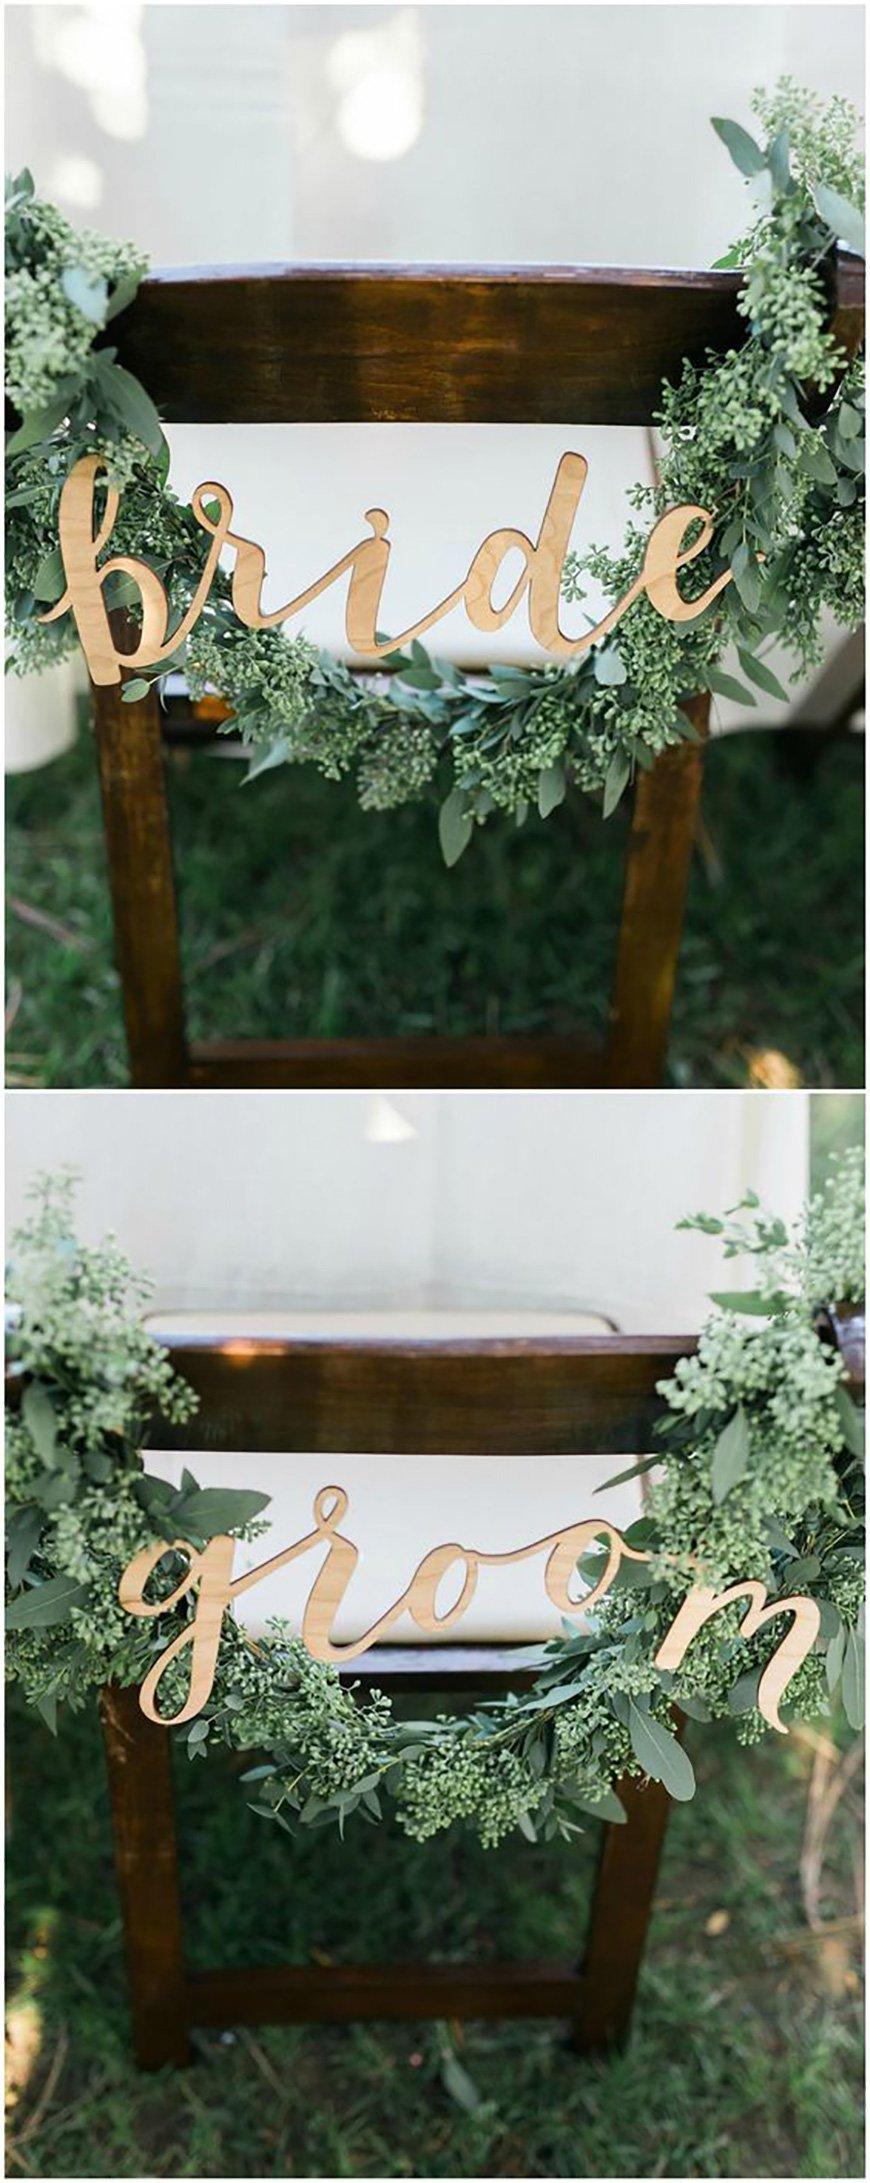 How To Throw The Best Winter Wedding - The best winter wedding ideas | CHWV